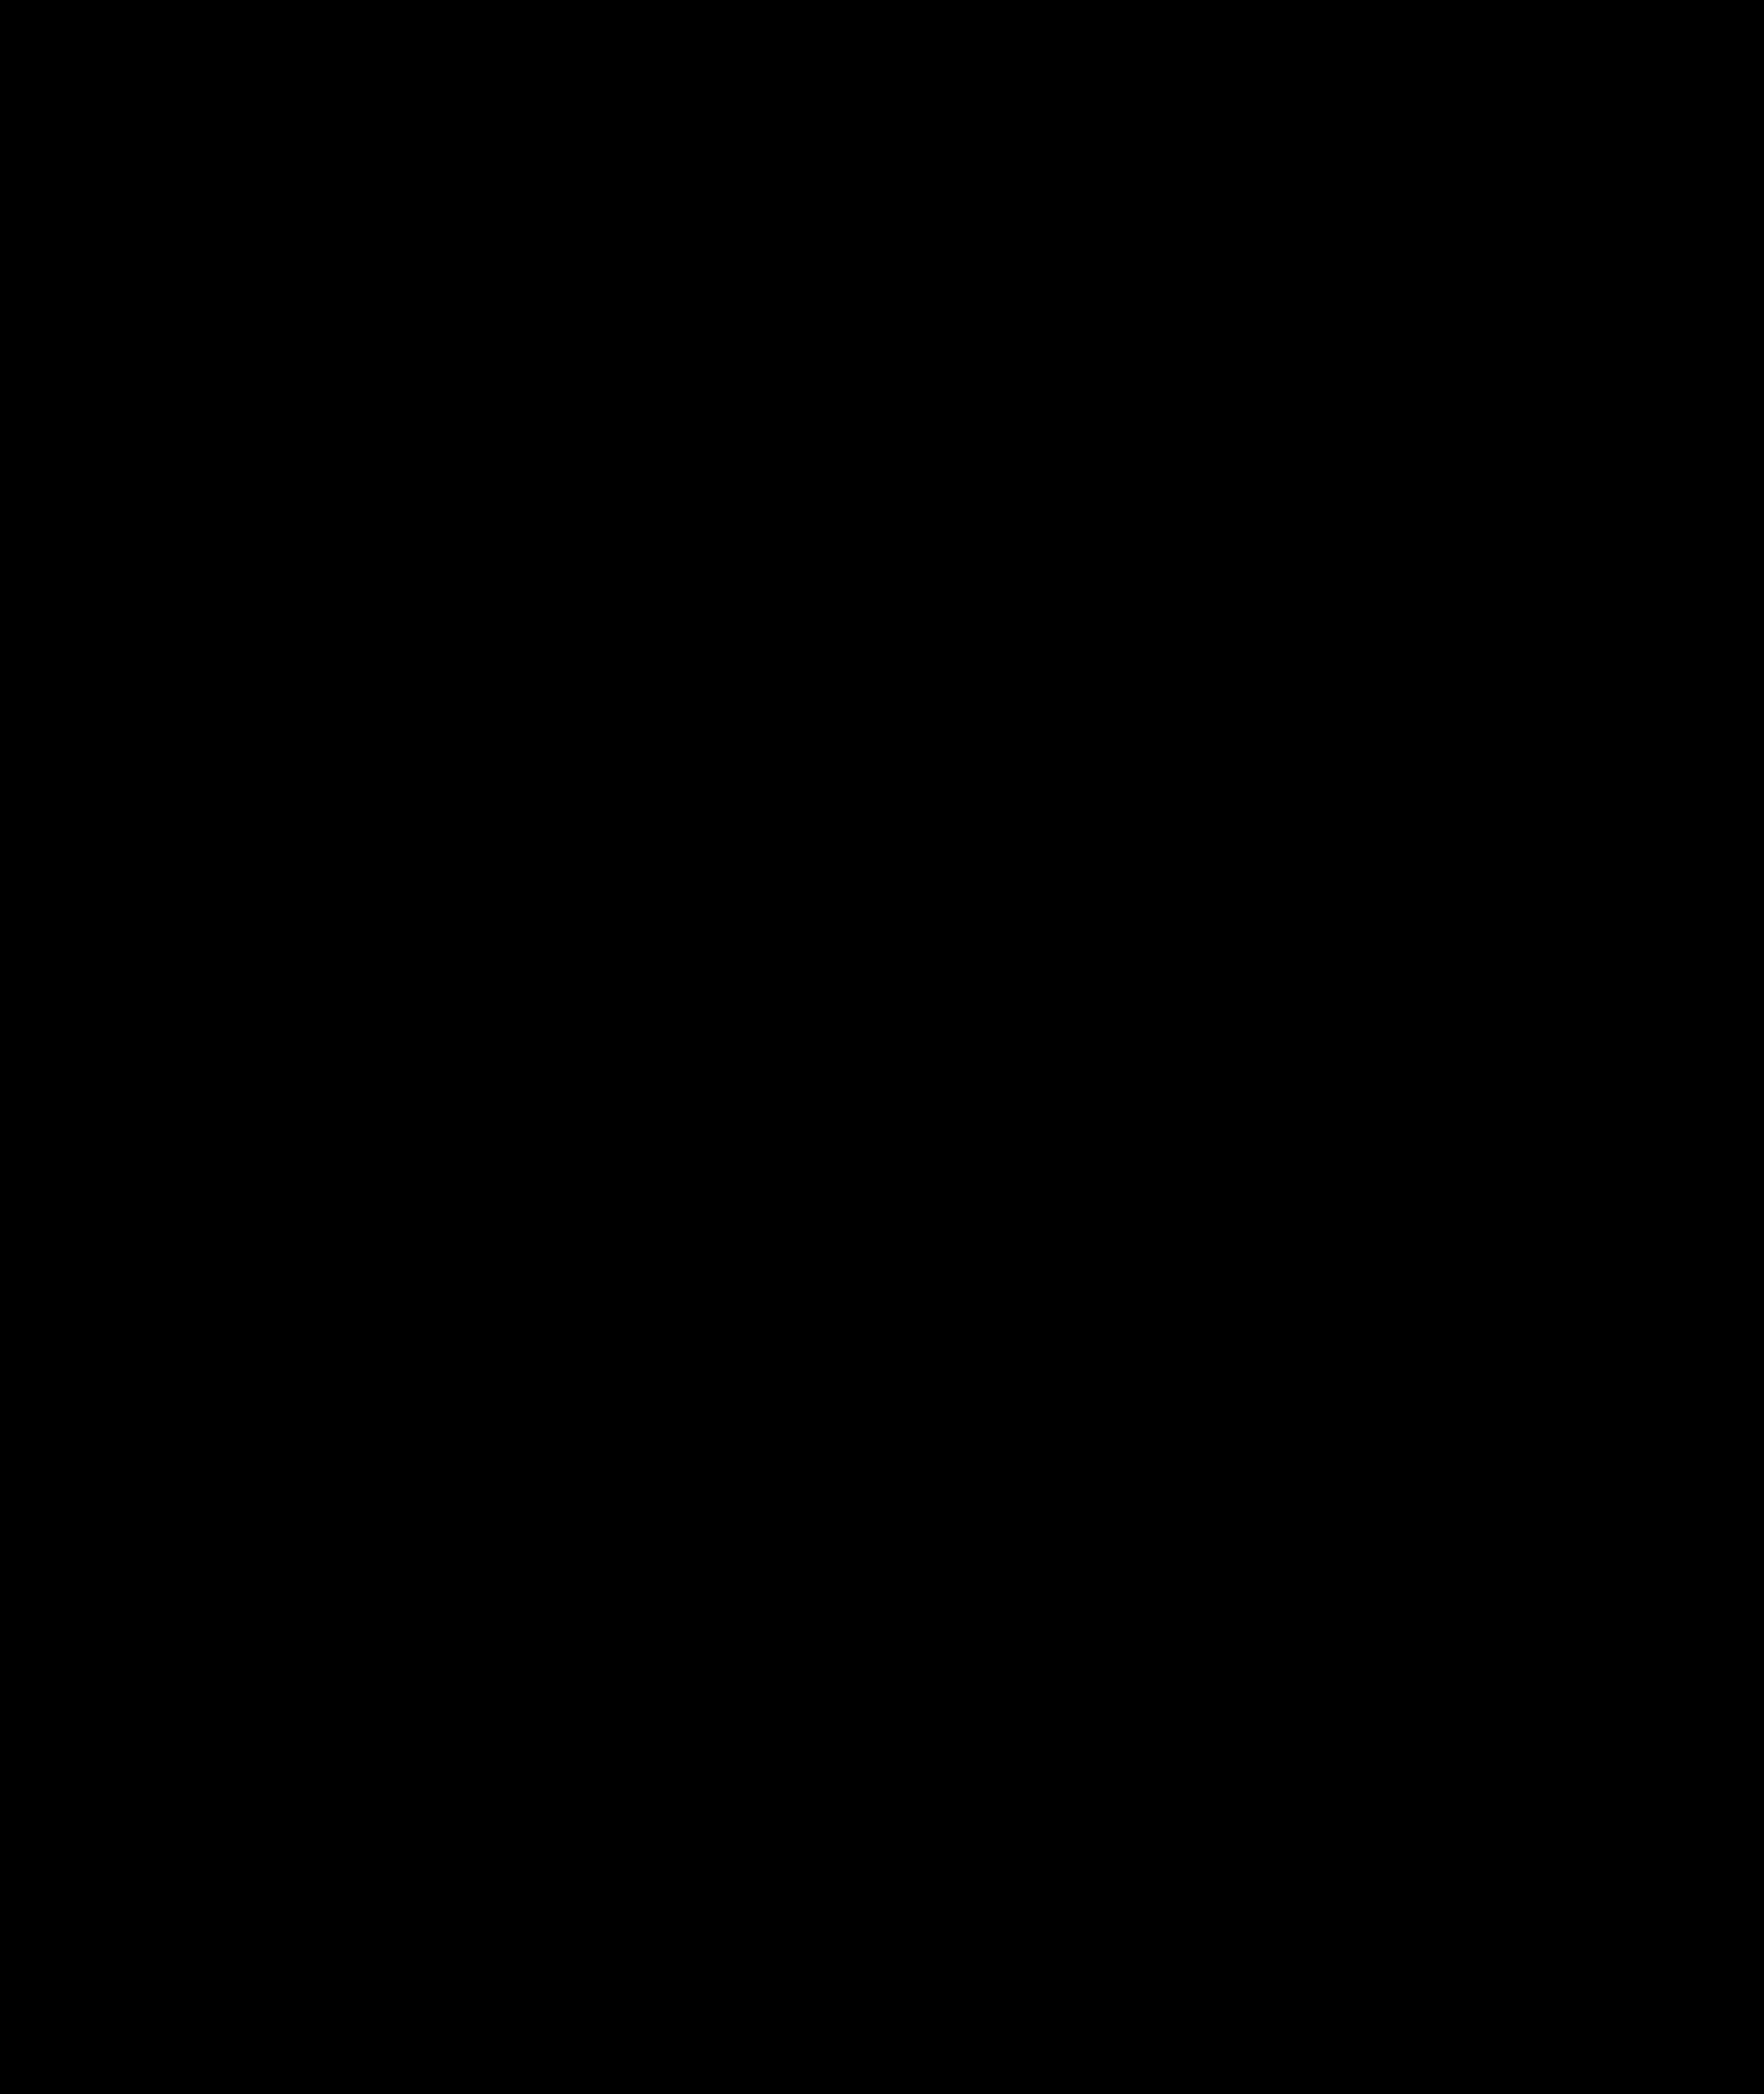 2022x2400 Clipart